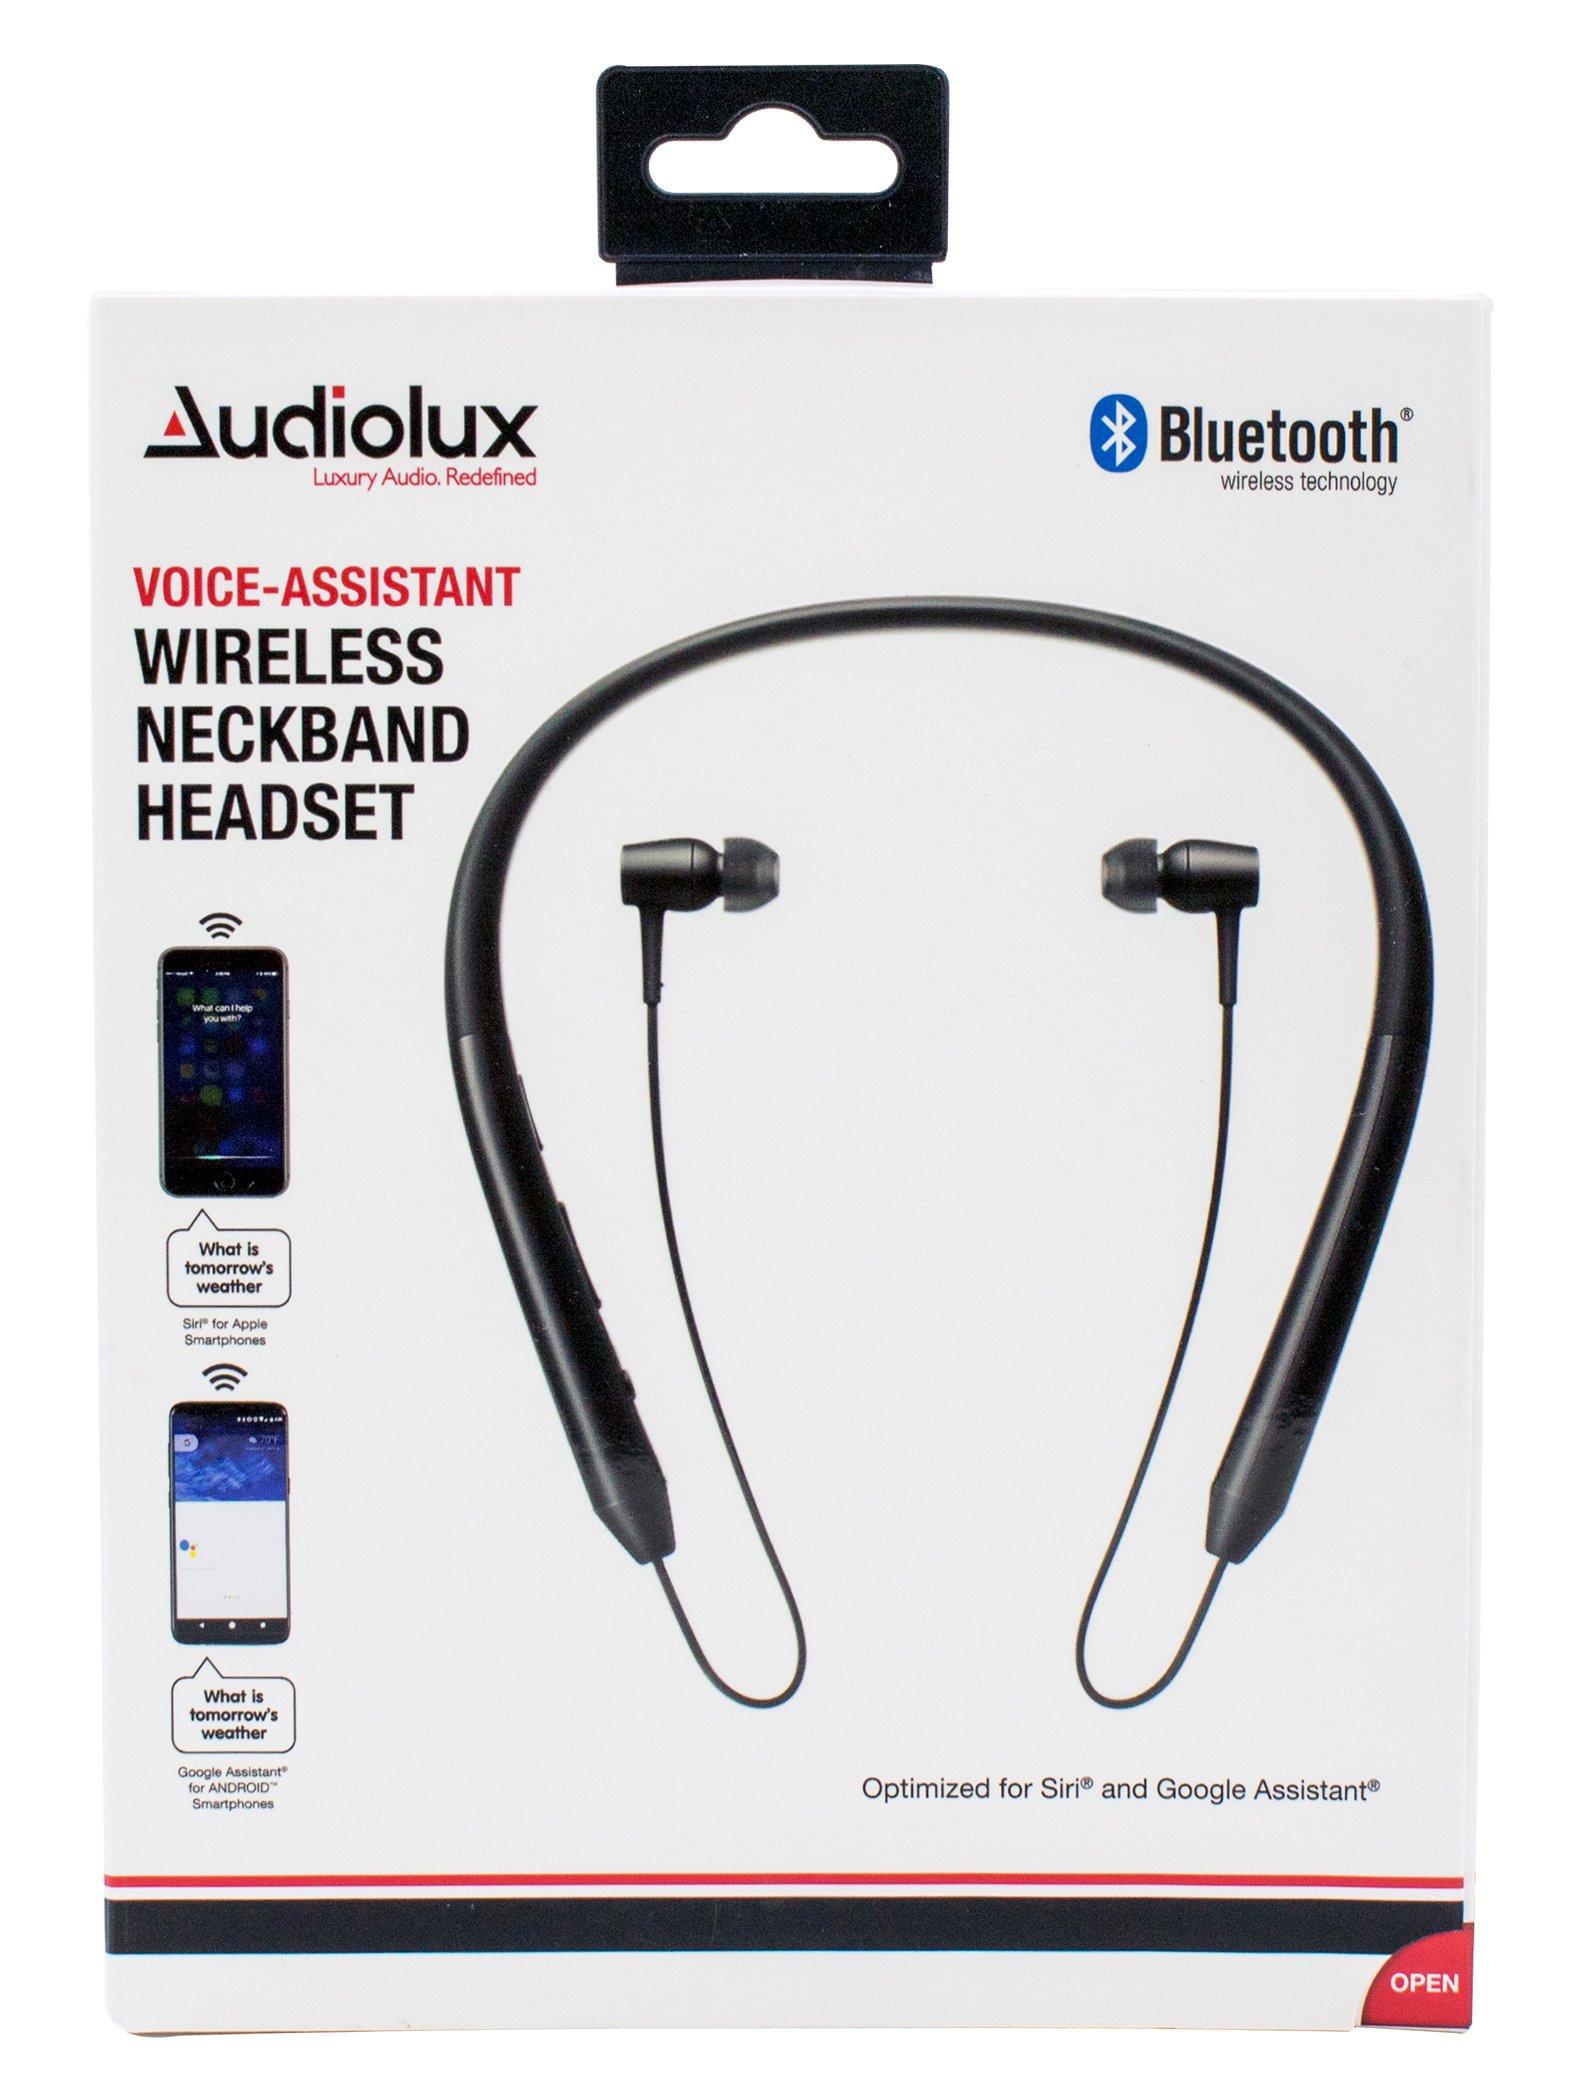 Audiolux Bluetooth Neckband Headset